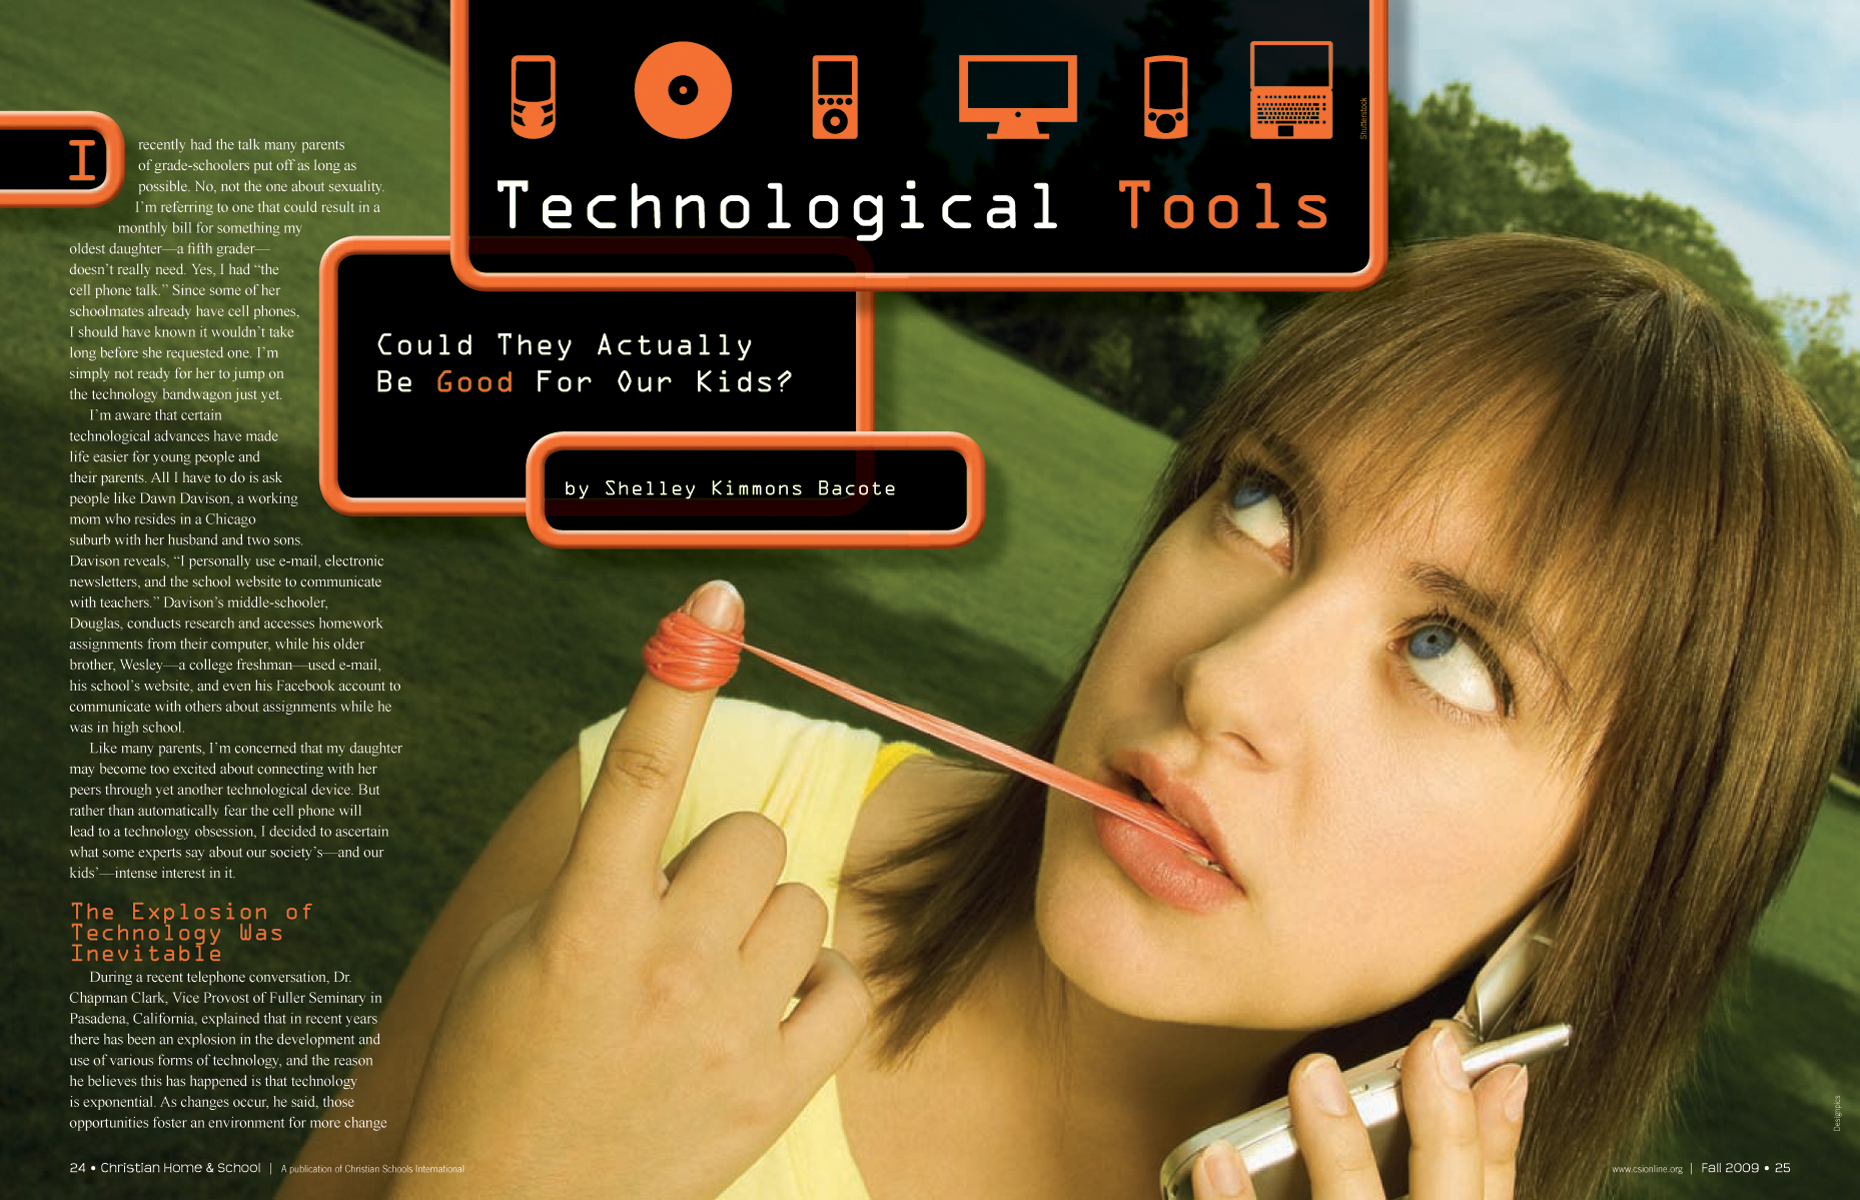 FamilyMagazineTechToolsSpread